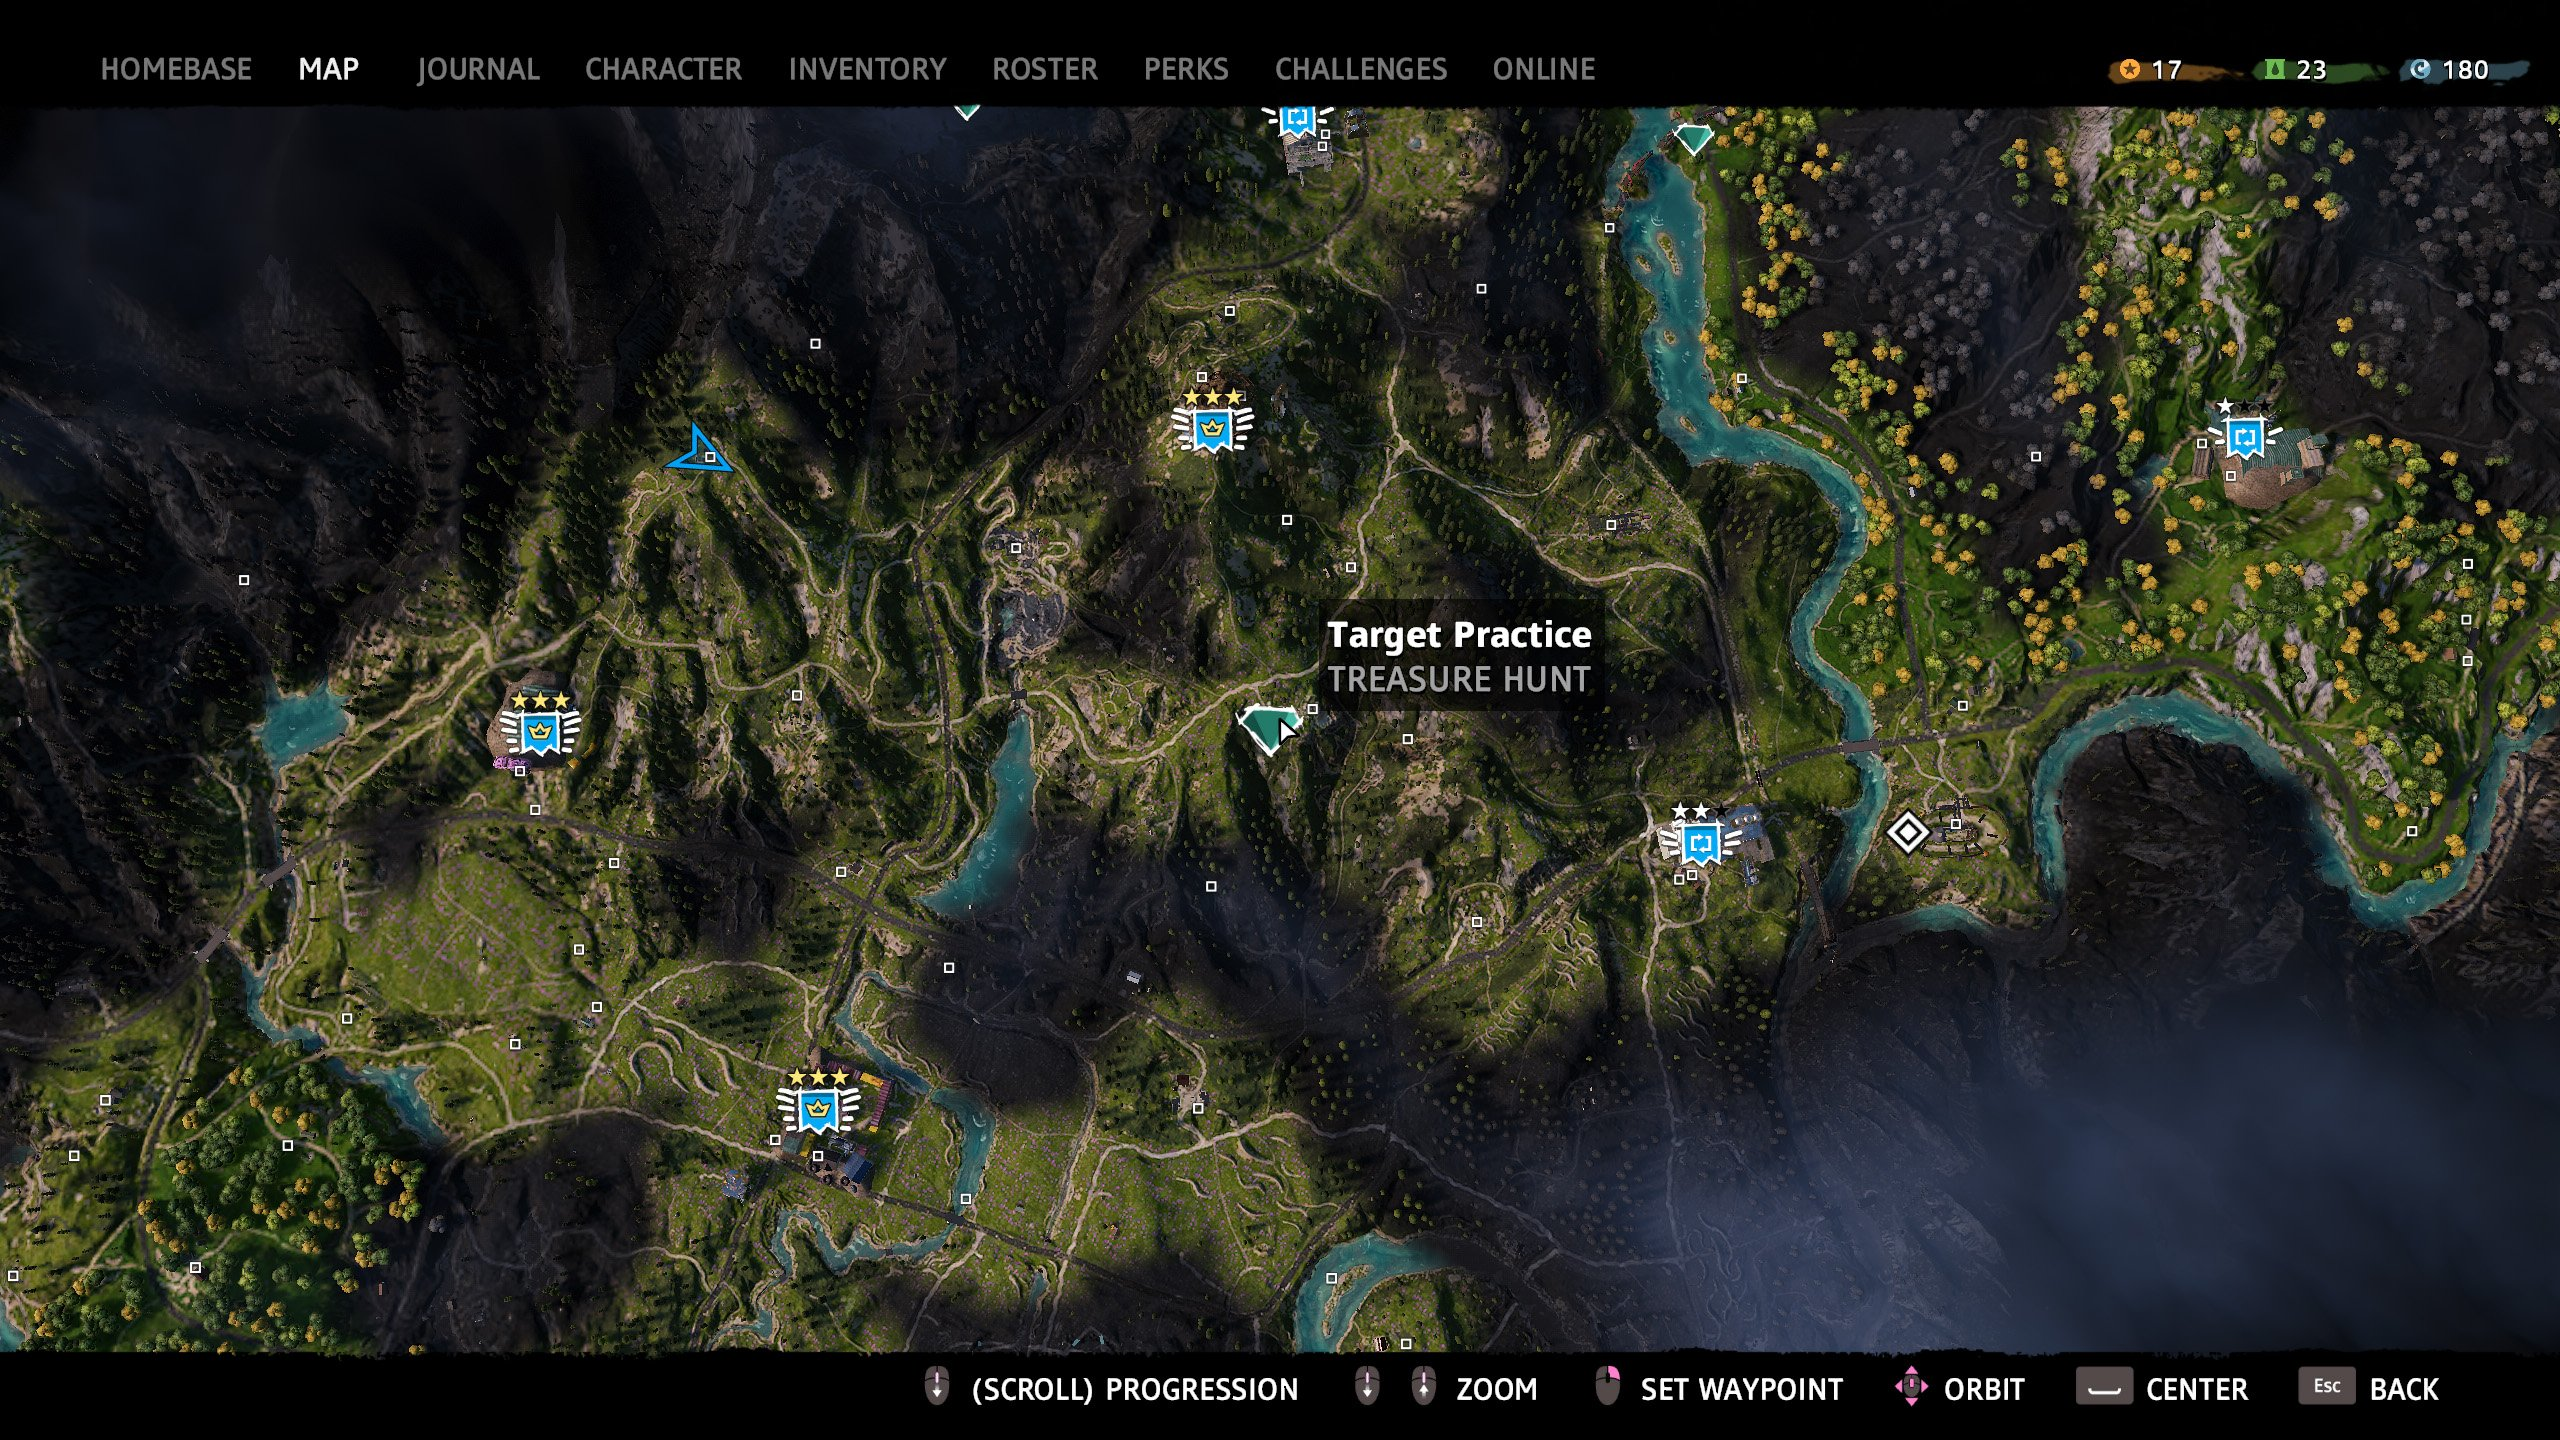 Target Practice Treasure Hunt